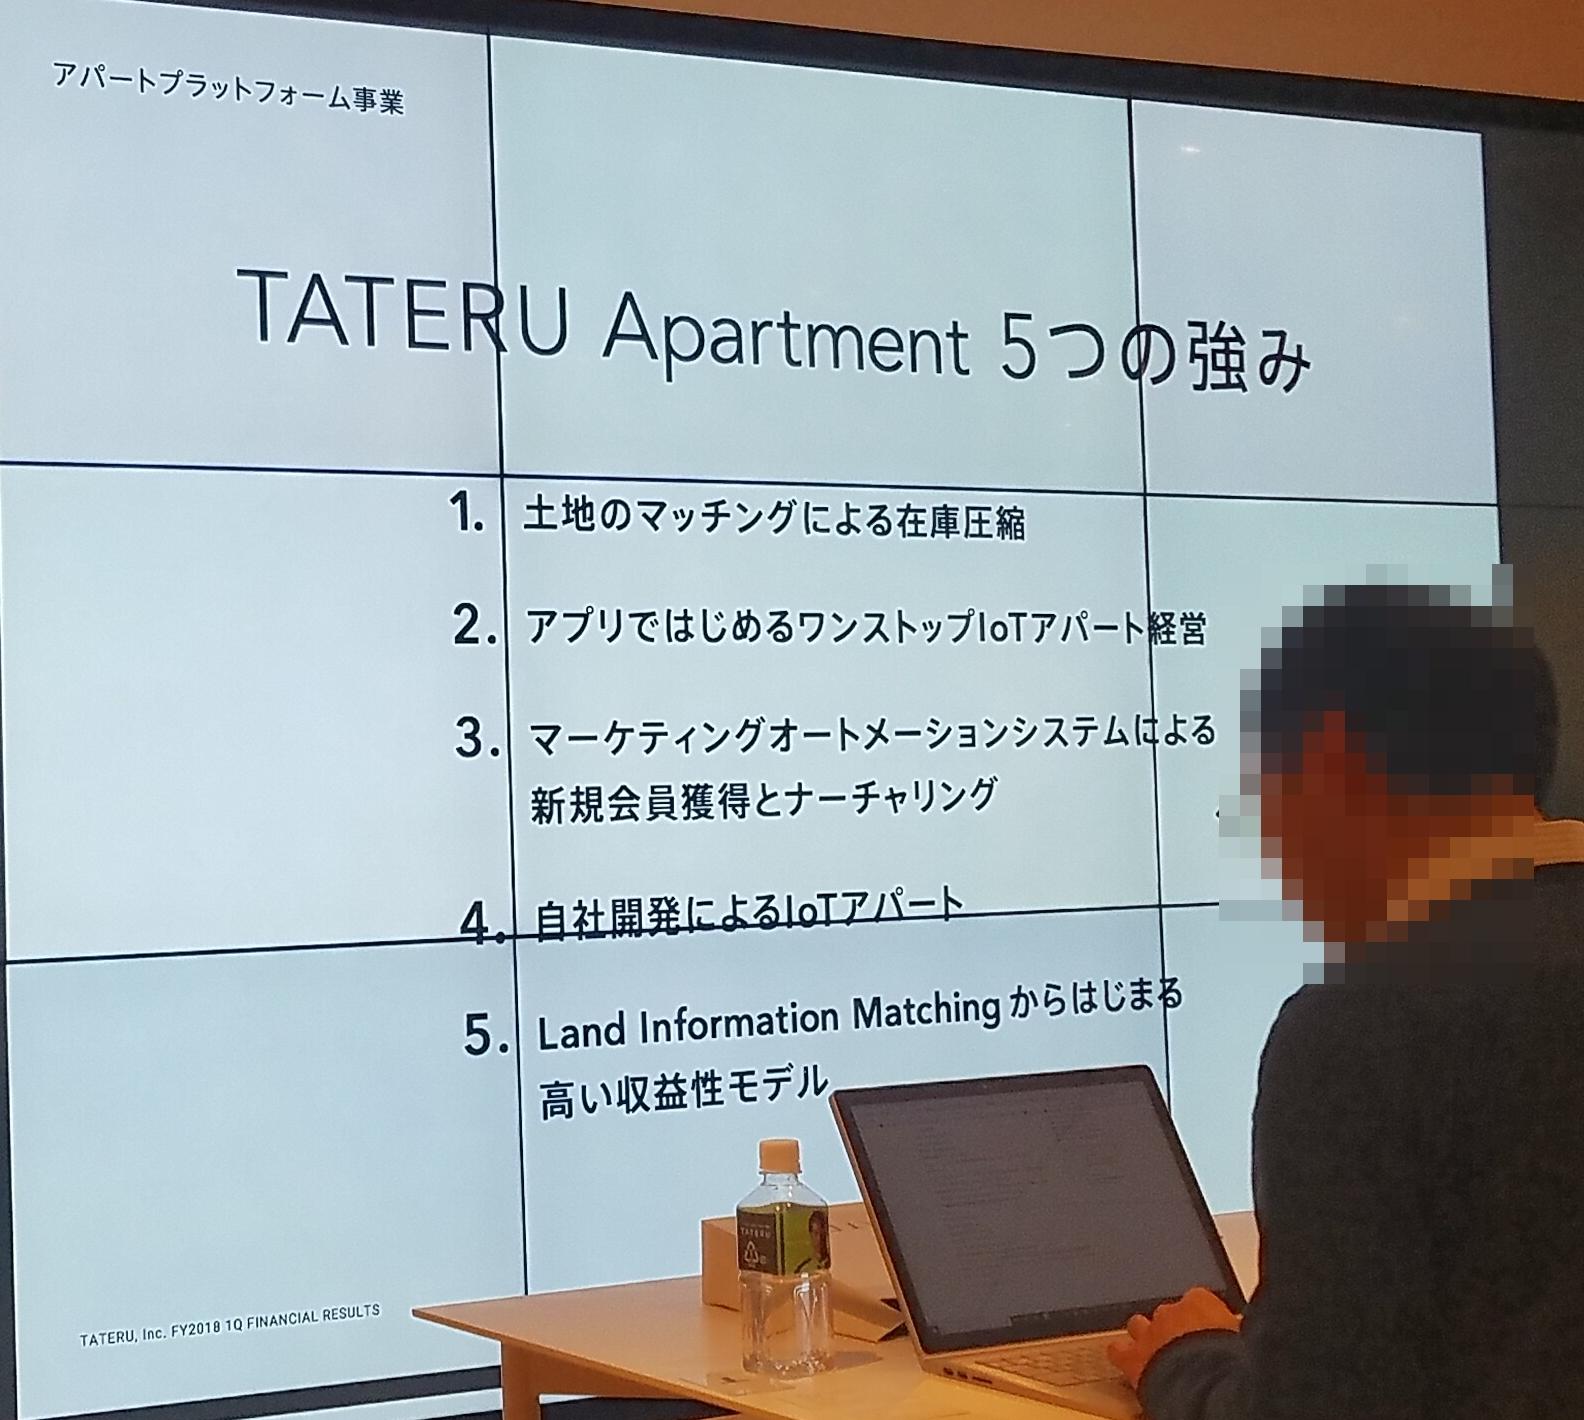 02_TATERU_Apartment